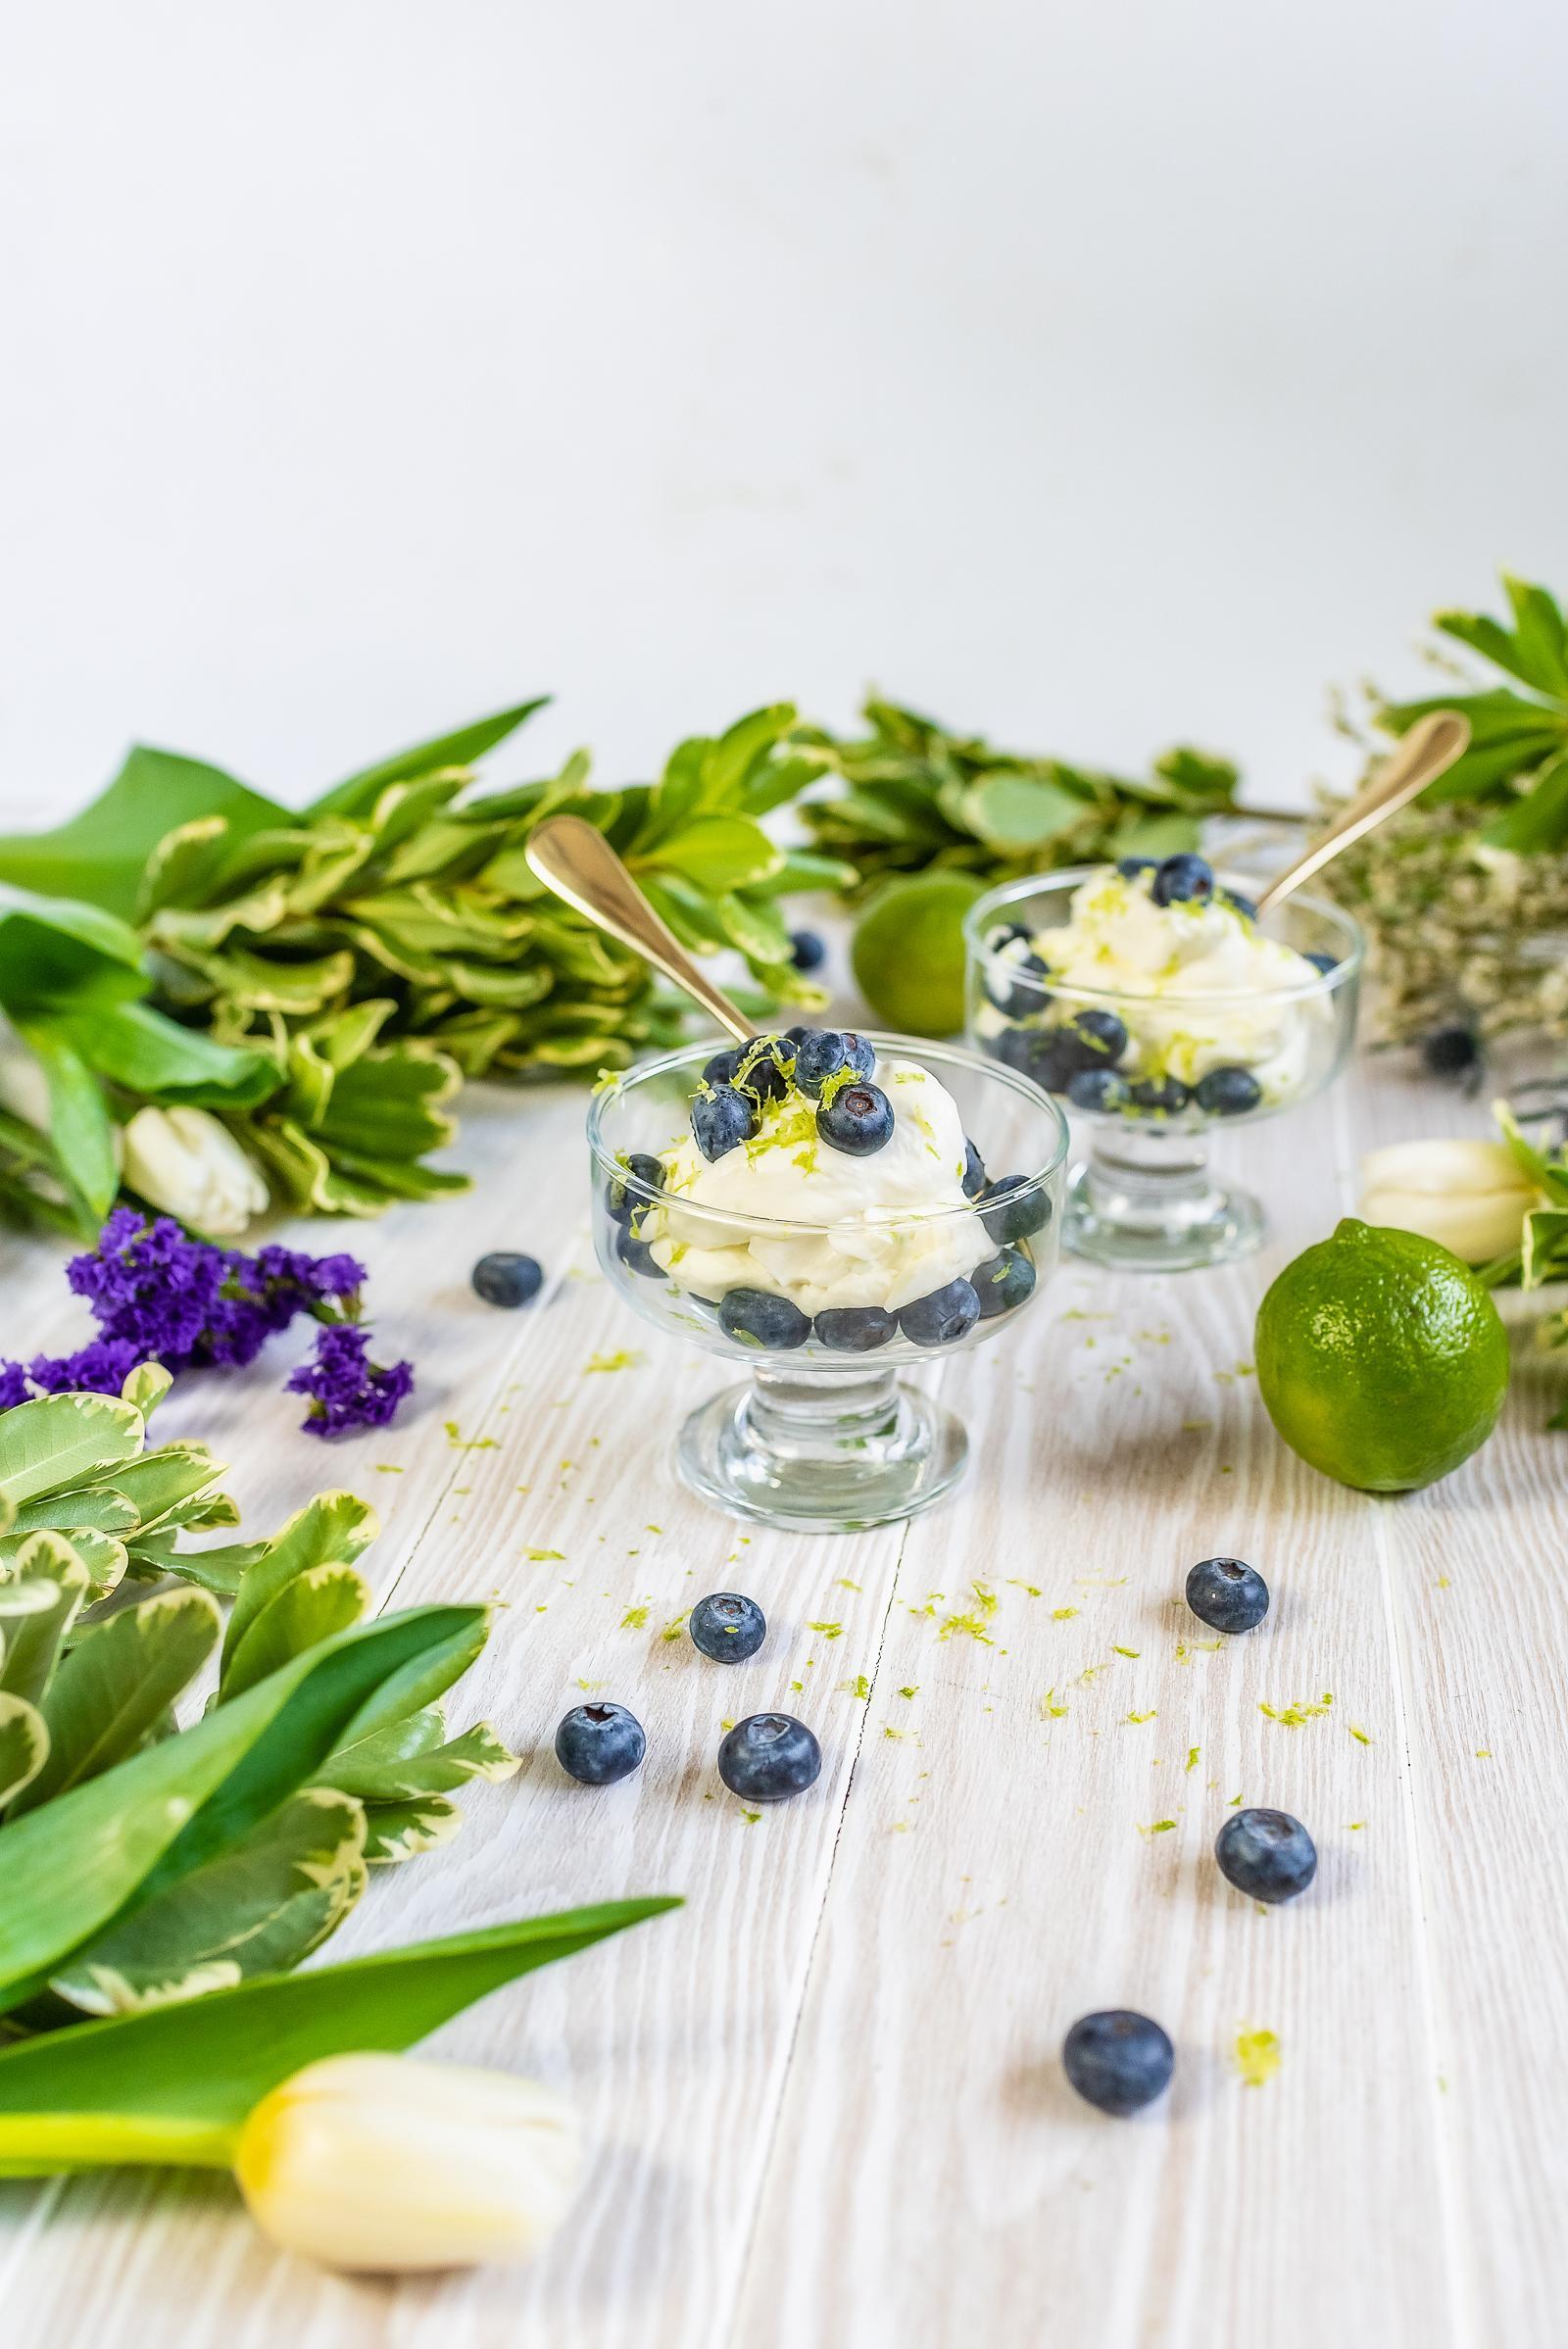 Blueberries & Whipped Cream Recipe